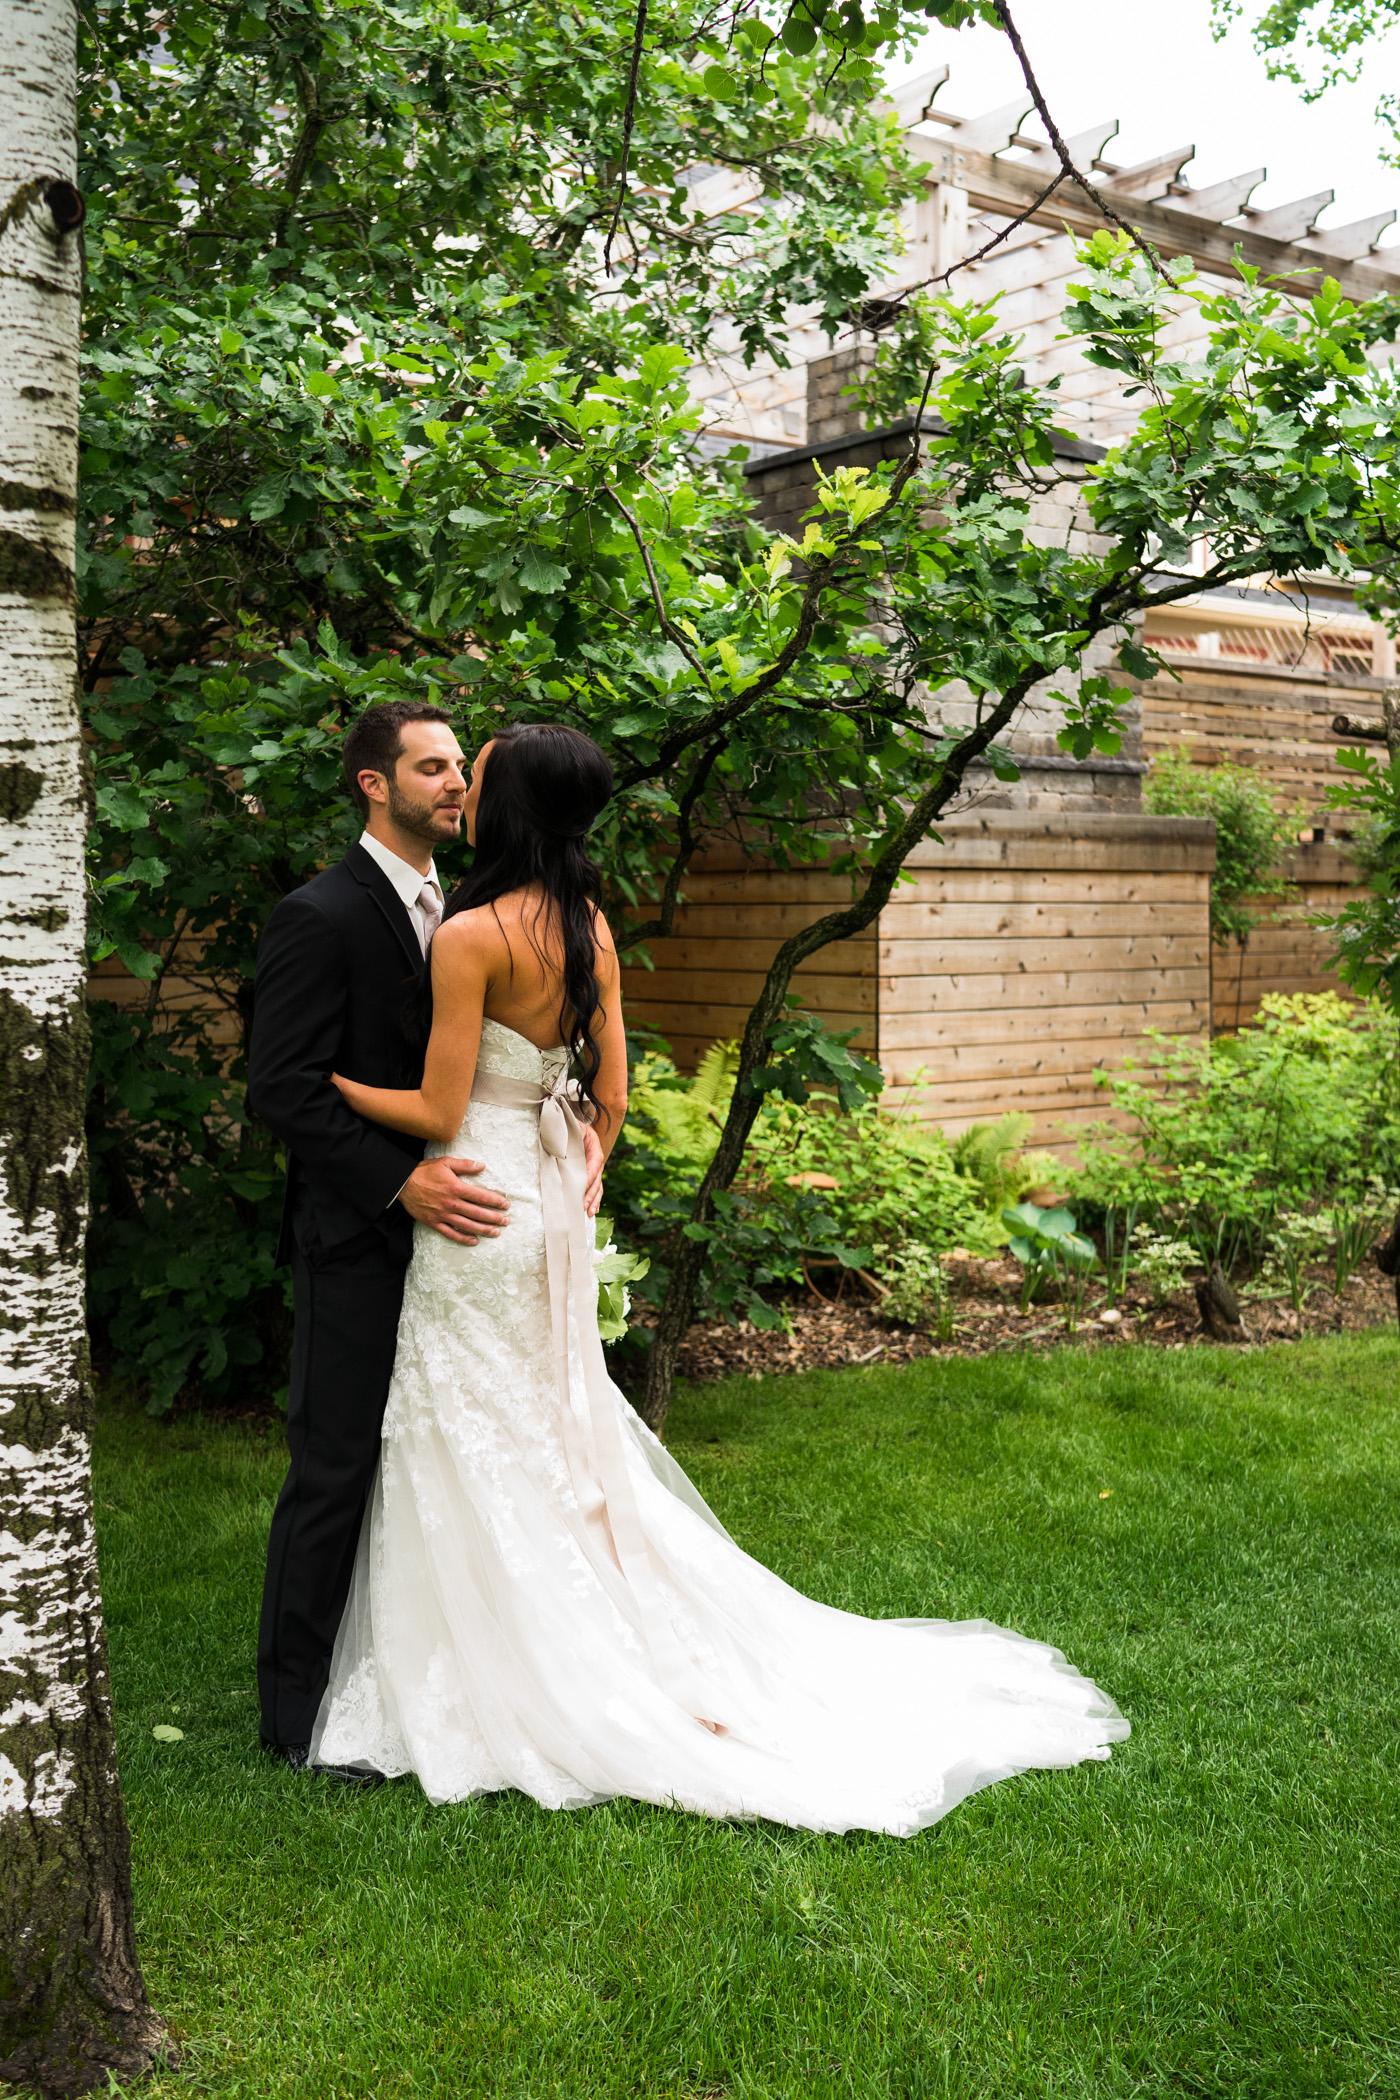 Hillary and Mark - Pineridge Hollow Wedding - Cojo Photo-313.jpg